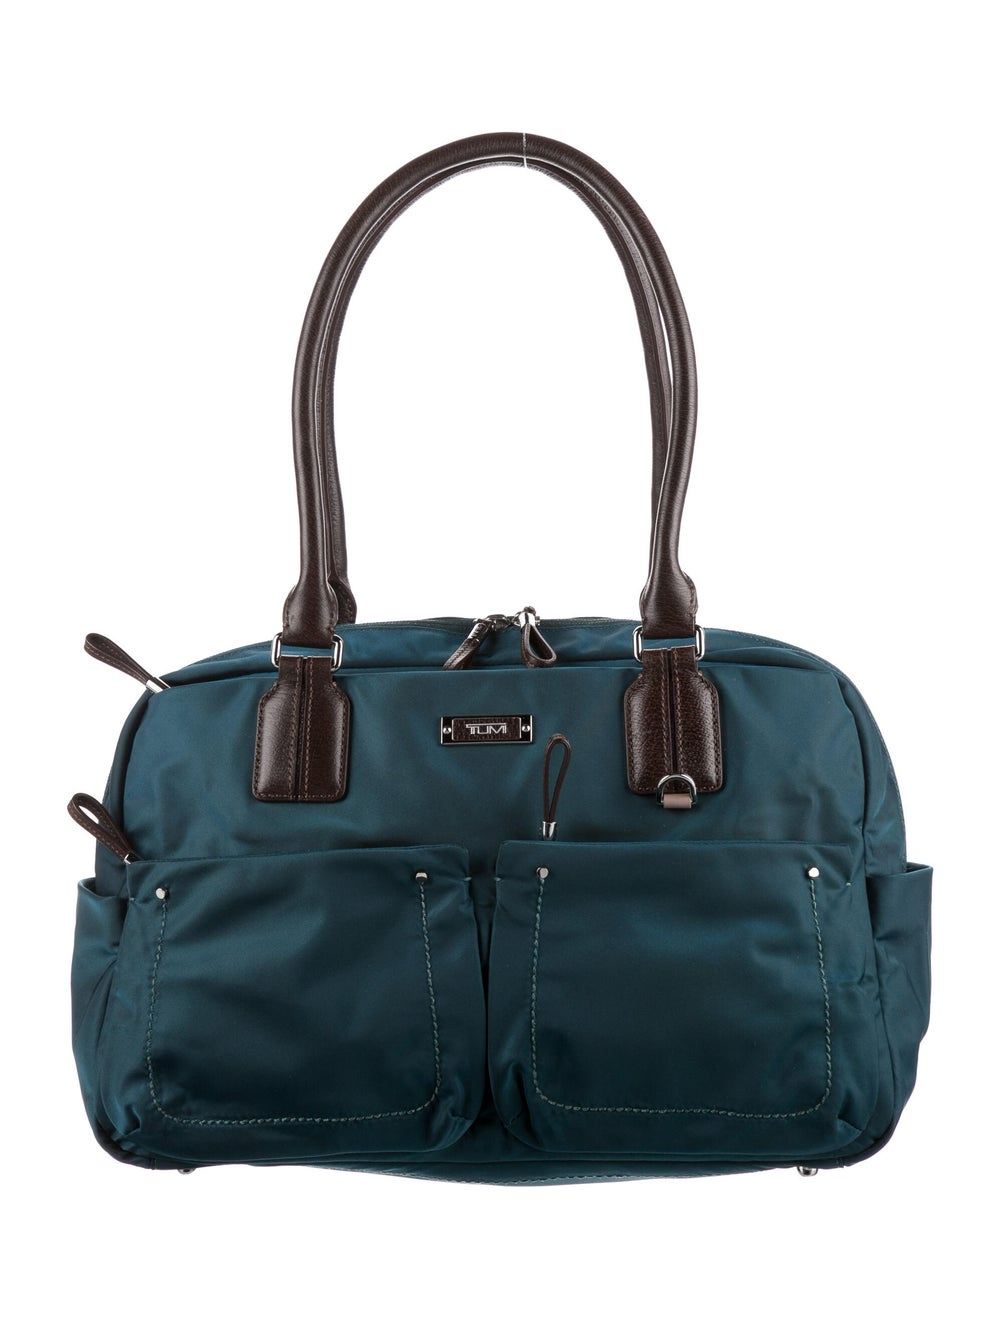 Tumi Nylon Shoulder Bag Blue - image 1